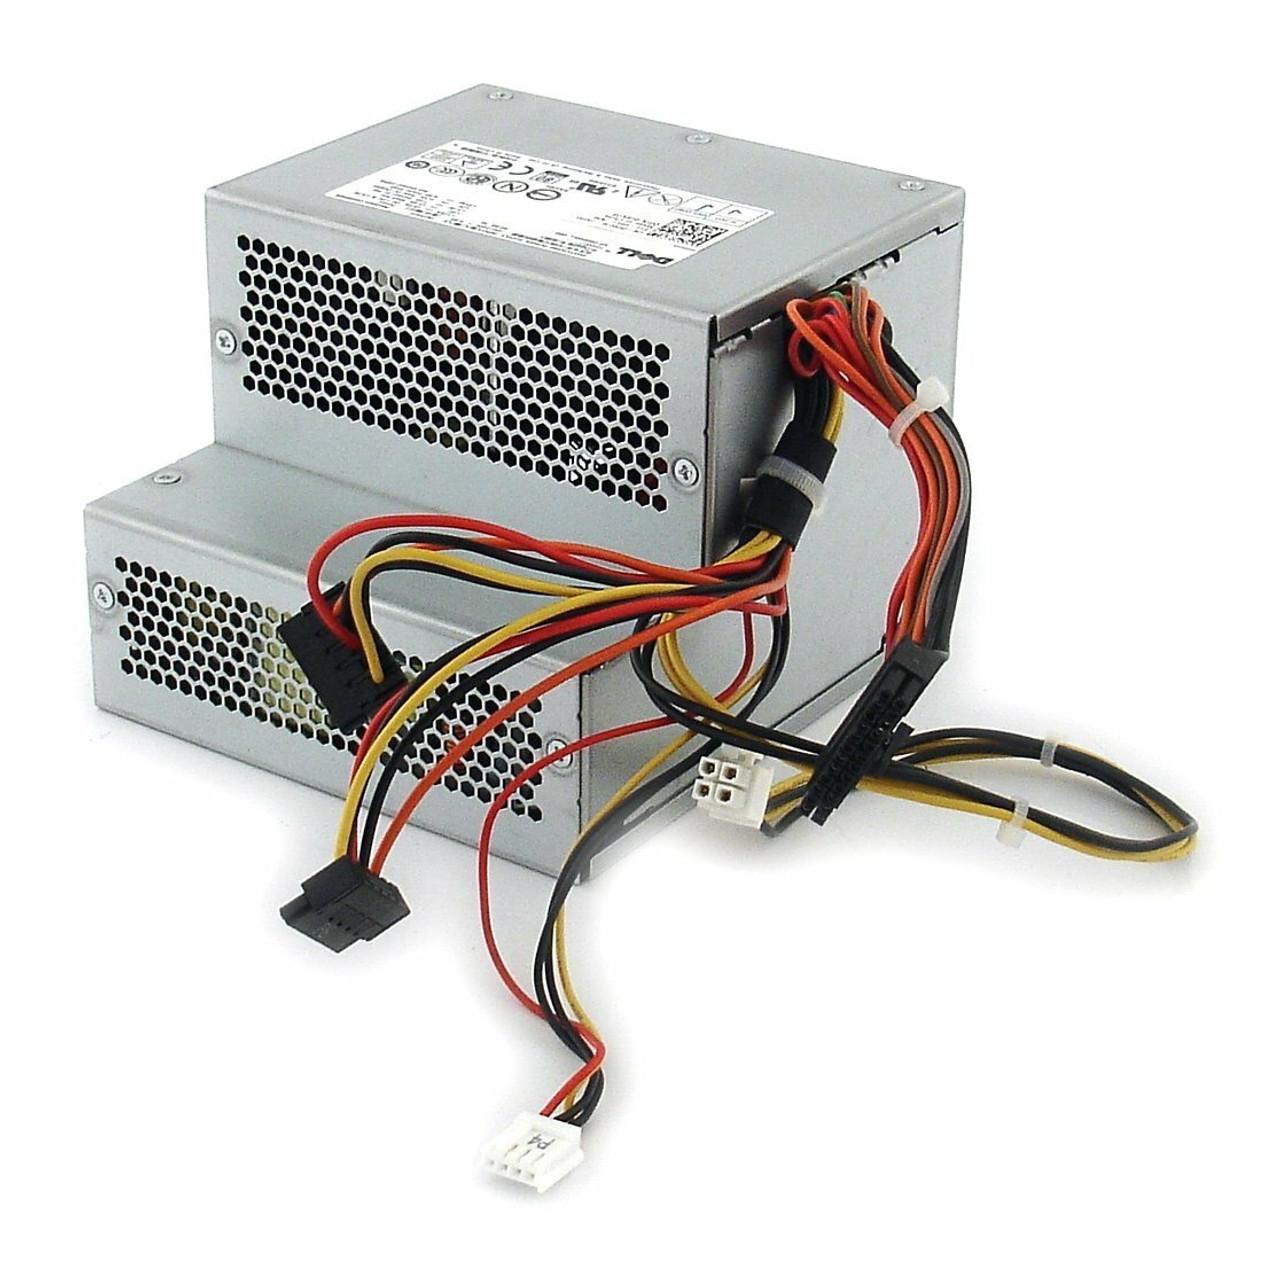 Dell Optiplex 580/760/780/960/980 Power Supply Midsize Desktop WU123 ...